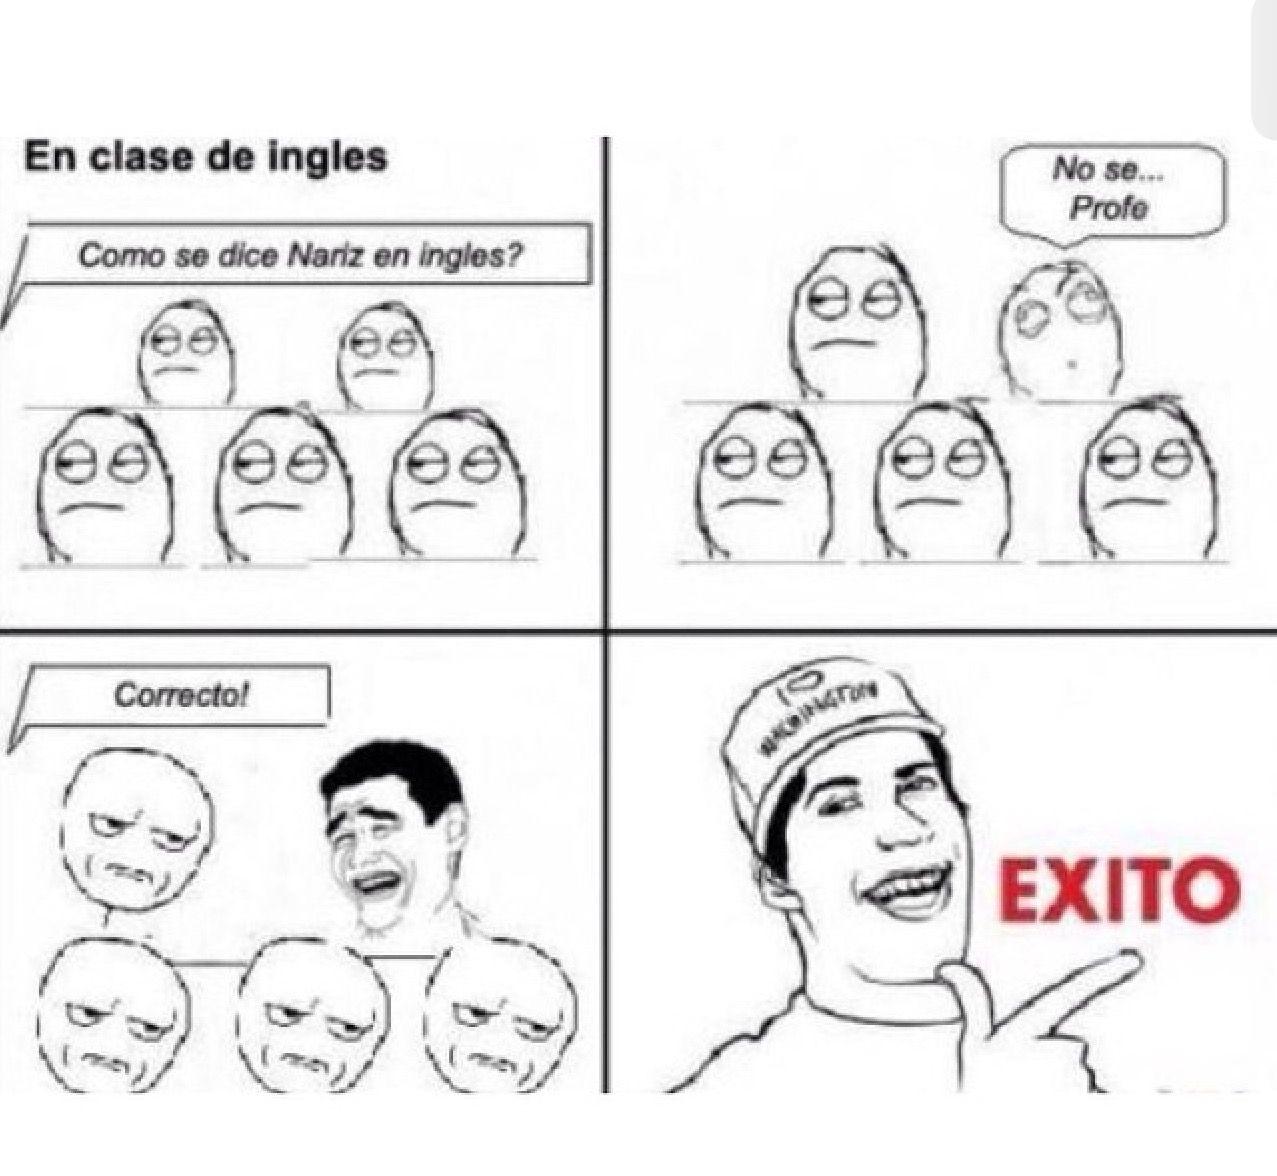 Pin De Jose Ceron En Humor Nariz En Ingles Memes Memes En Ingles